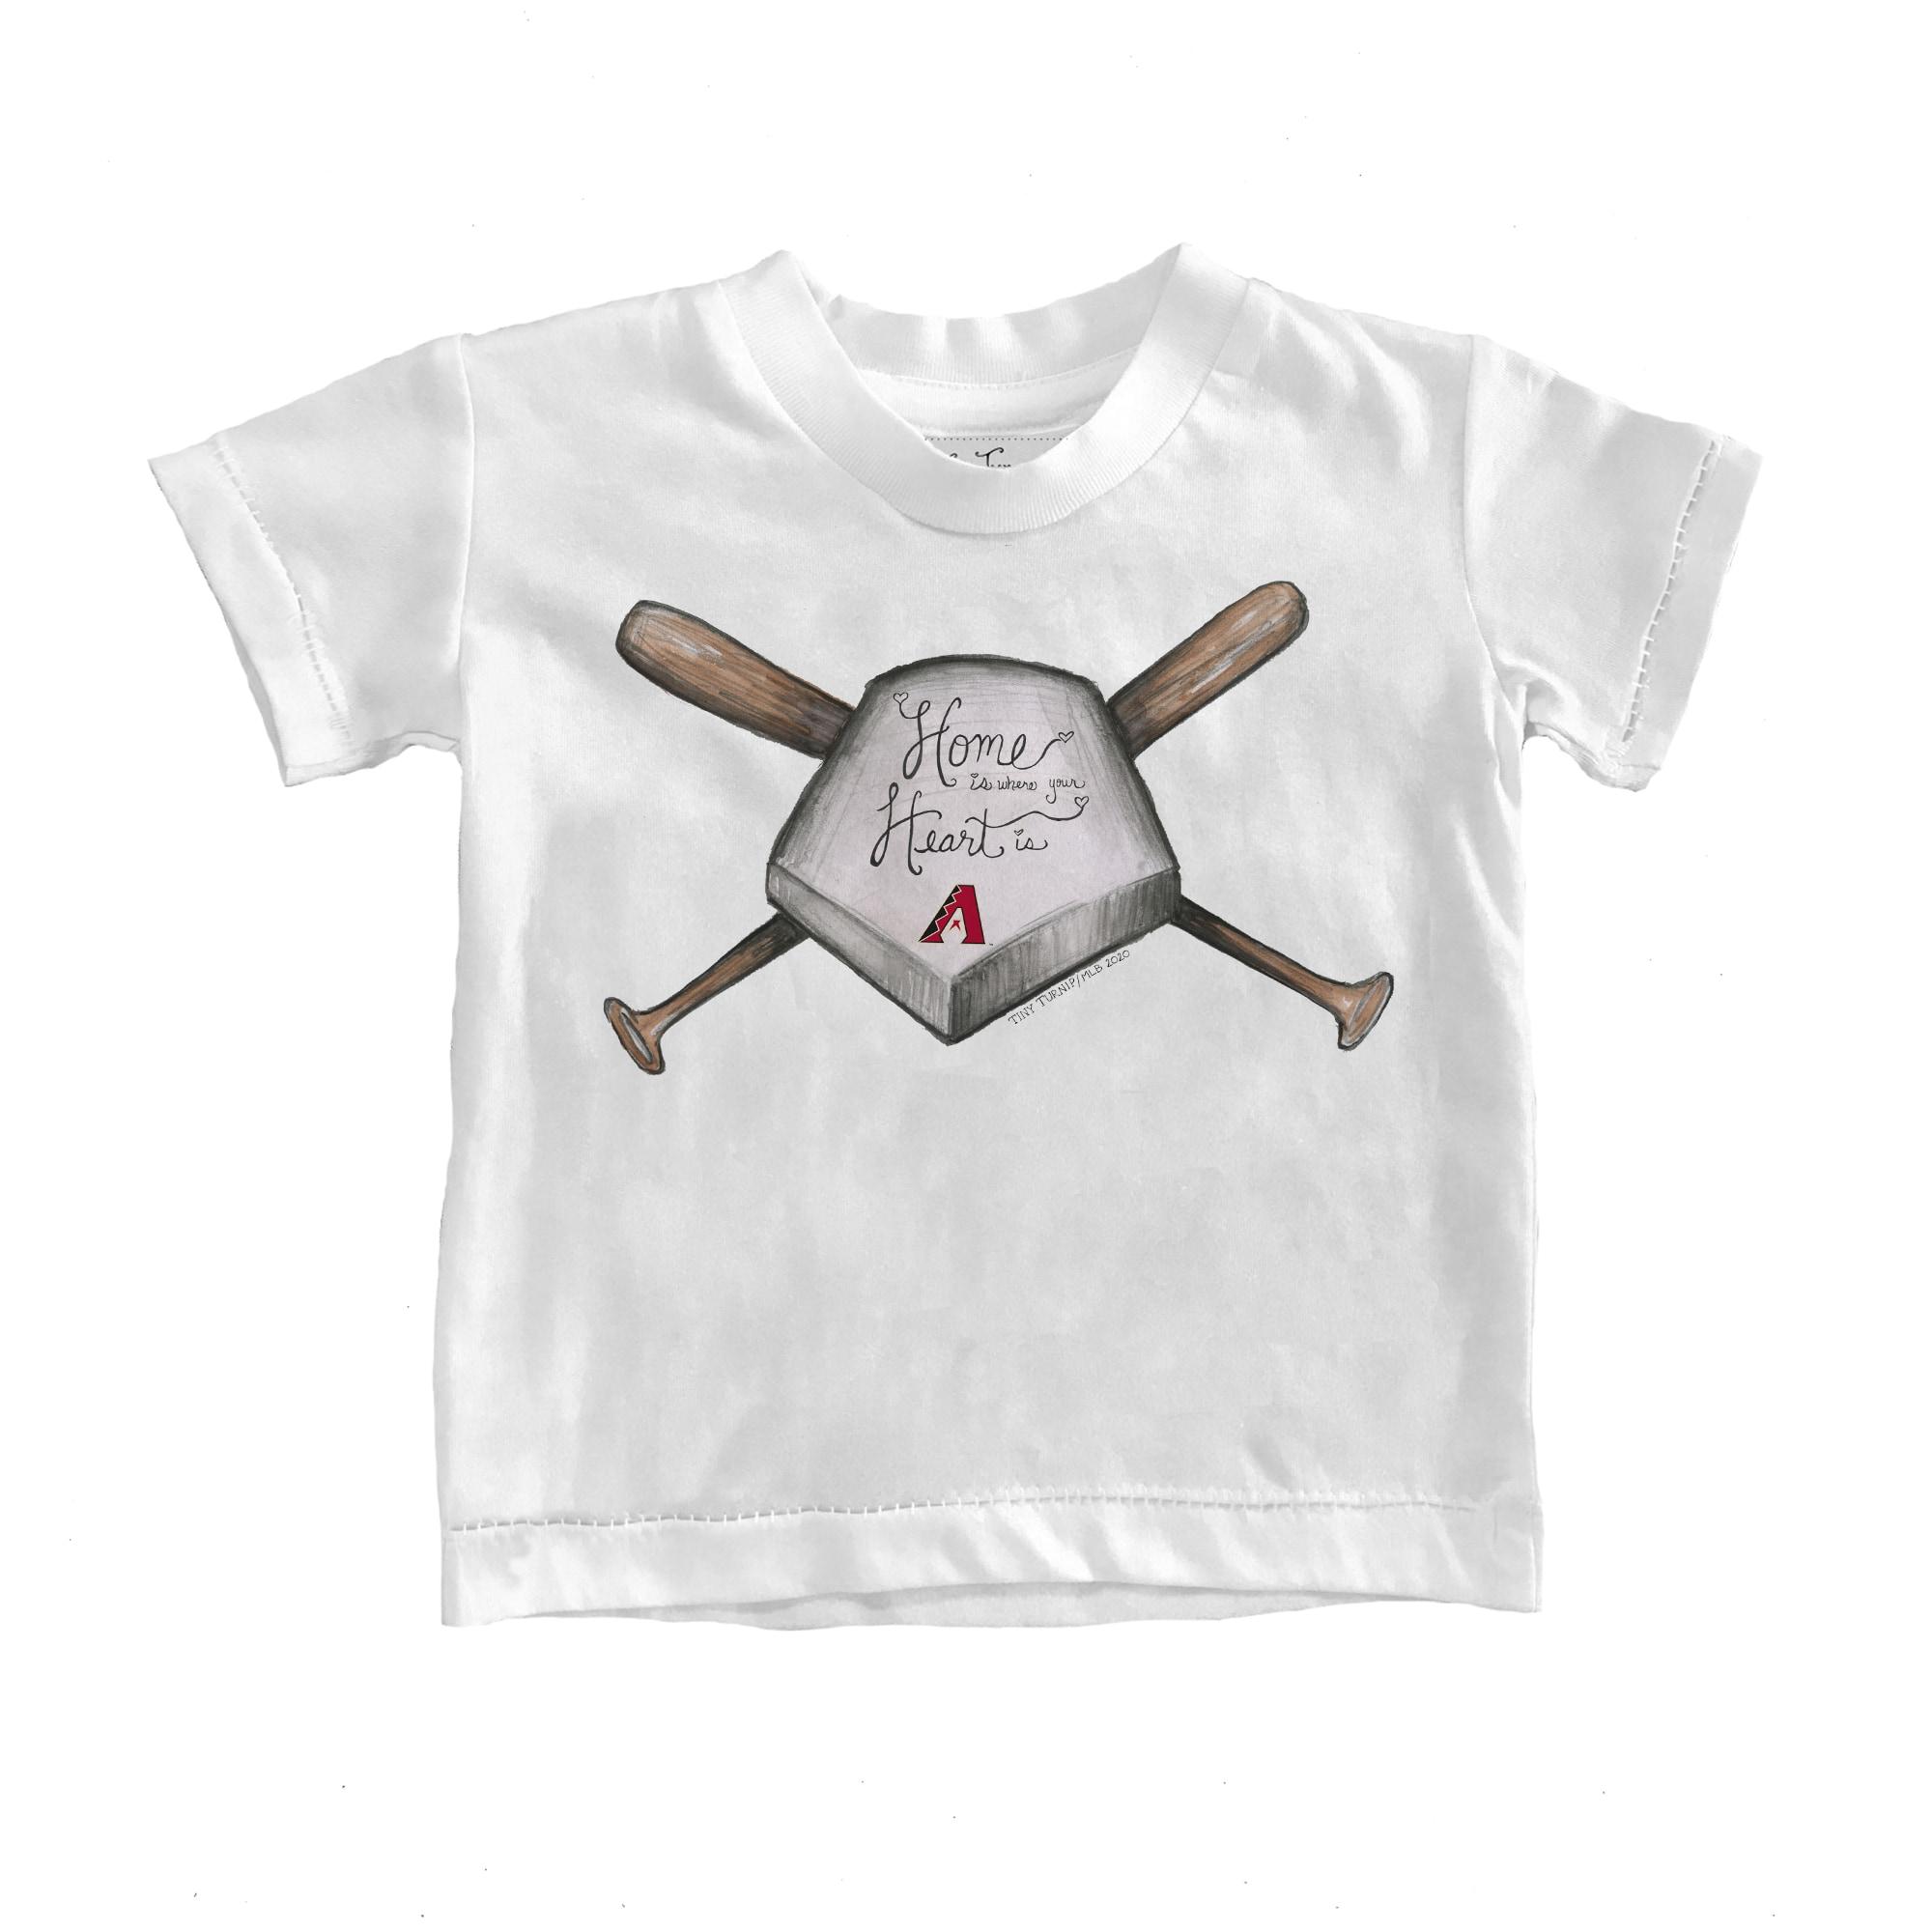 Arizona Diamondbacks Tiny Turnip Infant Home Is Where Your Heart Is T-Shirt - White